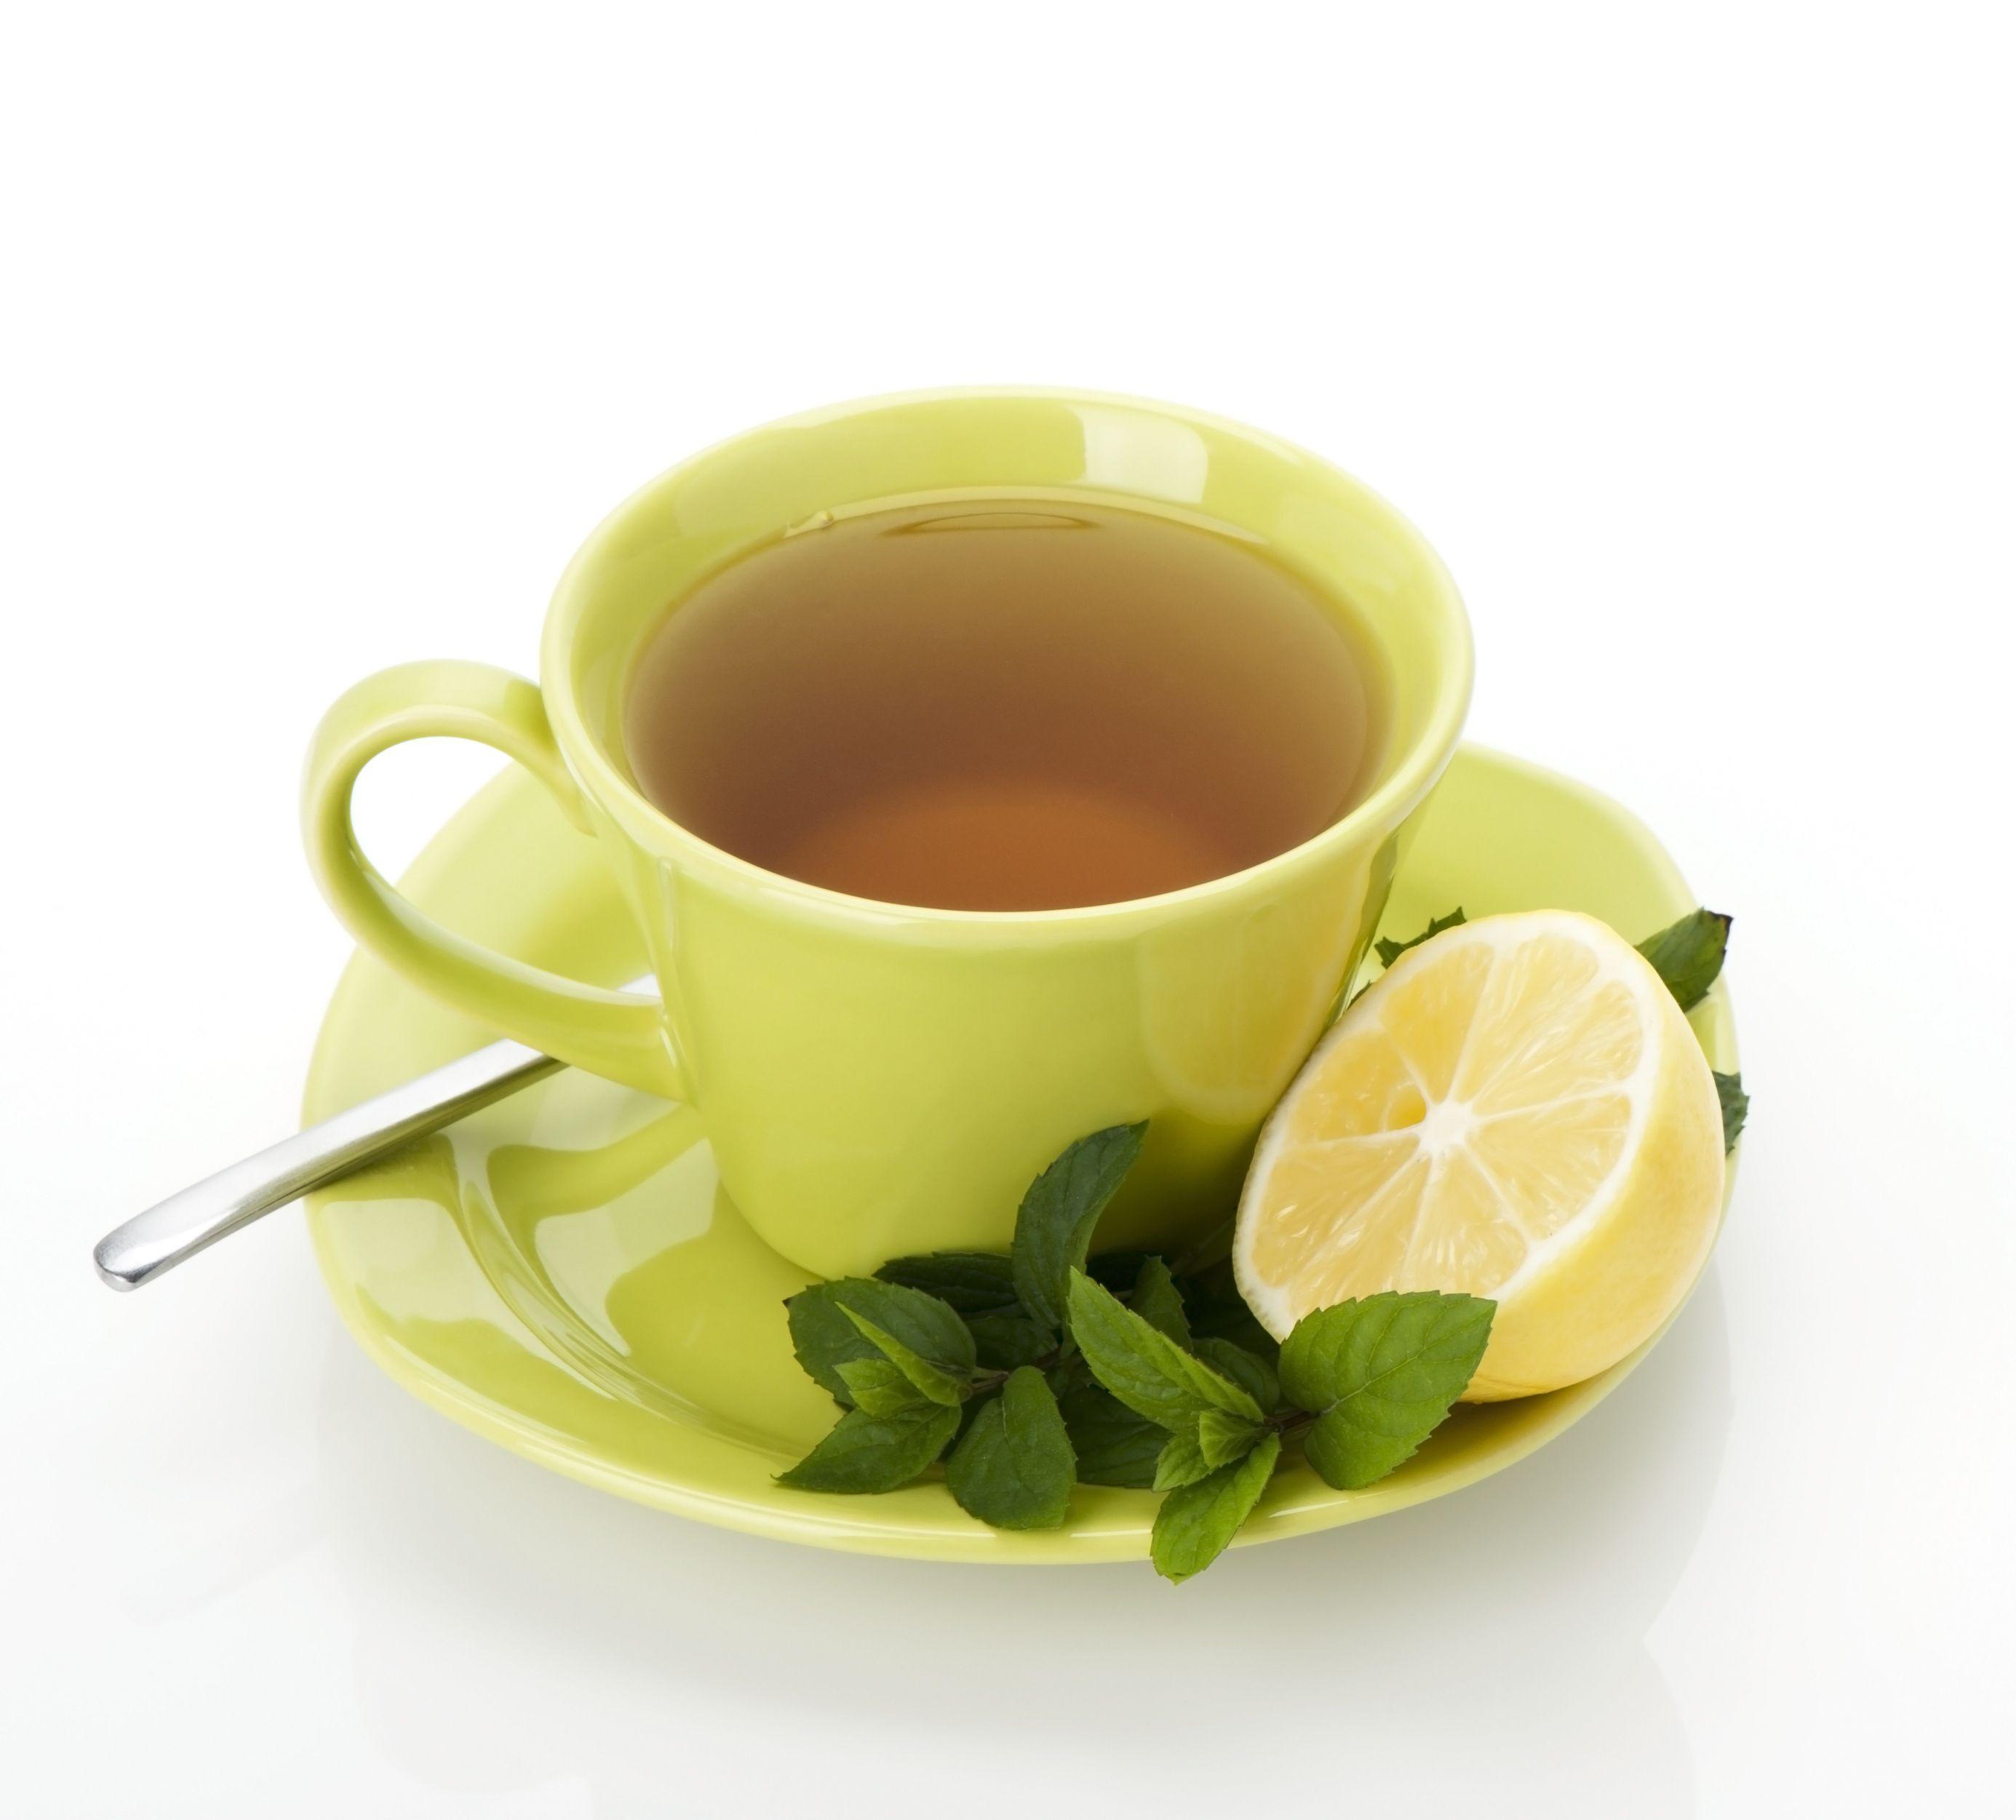 Lemon Tea Market: Comprehensive Study Explores Huge Growth in Future : PepsiCo, MONIN, Joe Tea